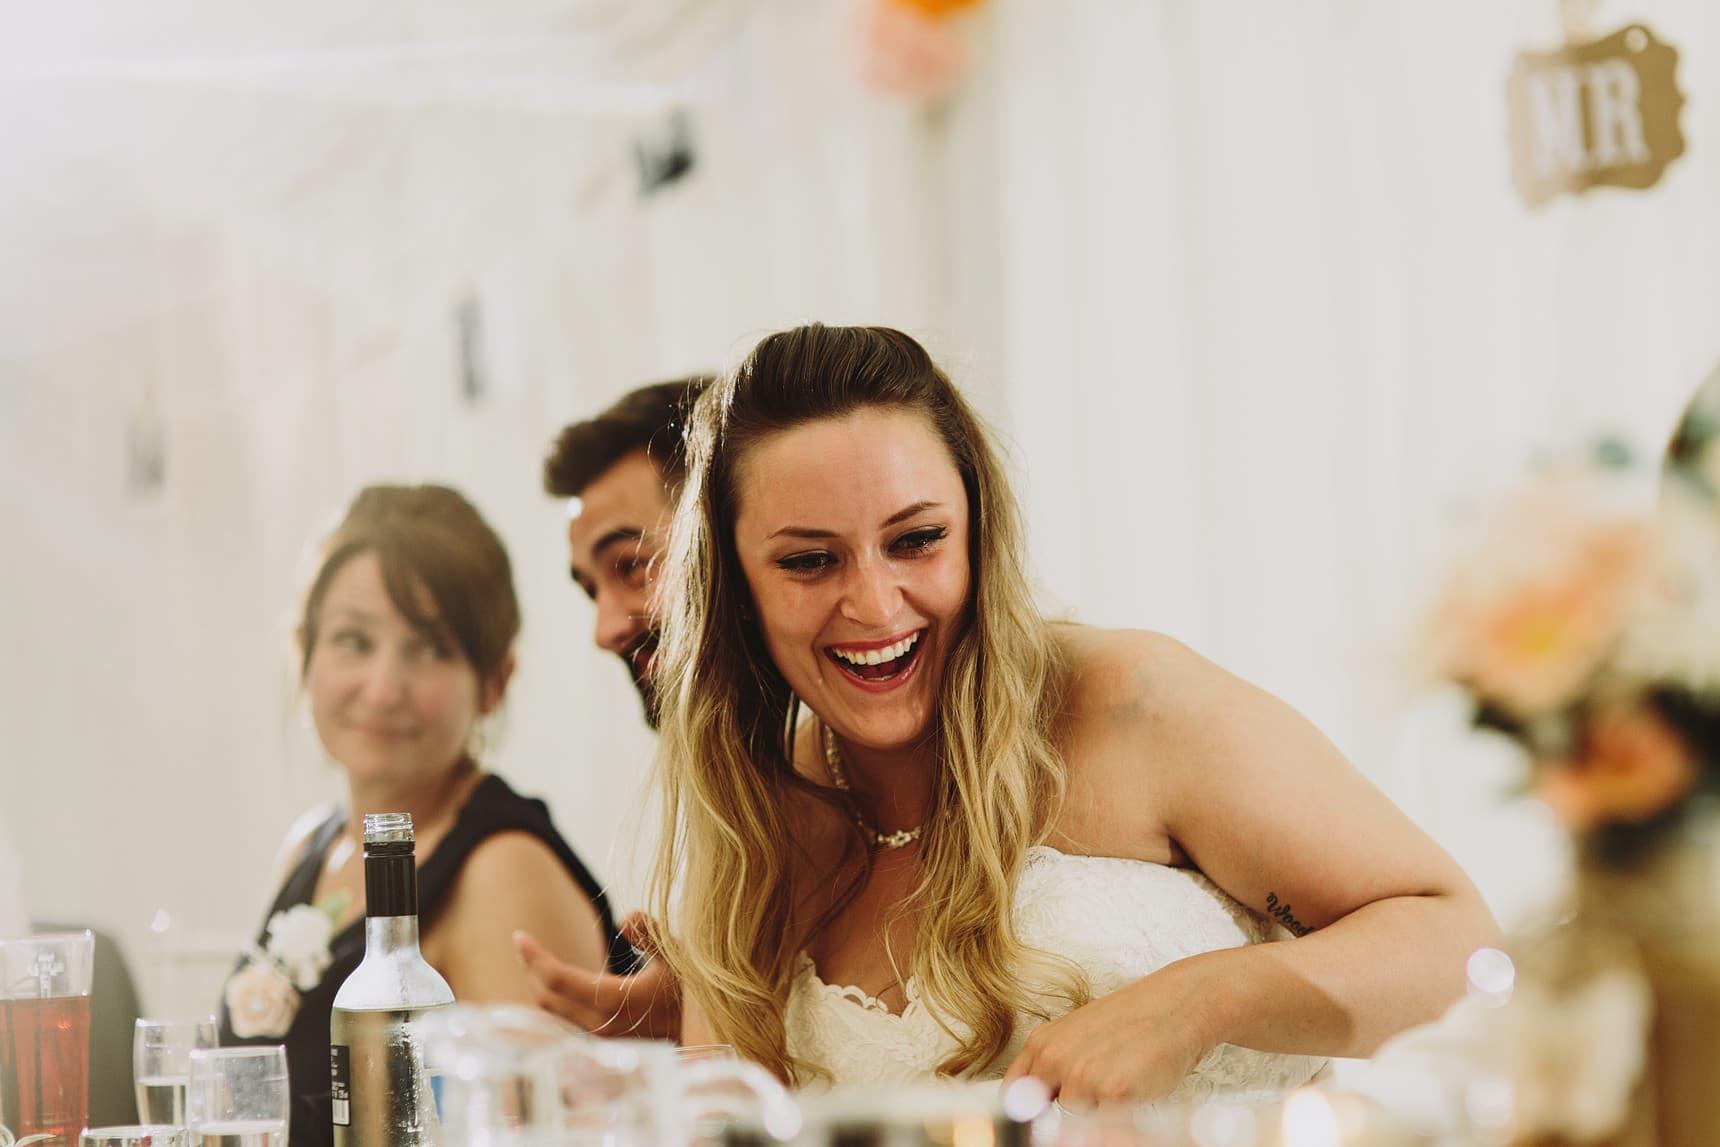 weddings at rochford hundred golf club in essex